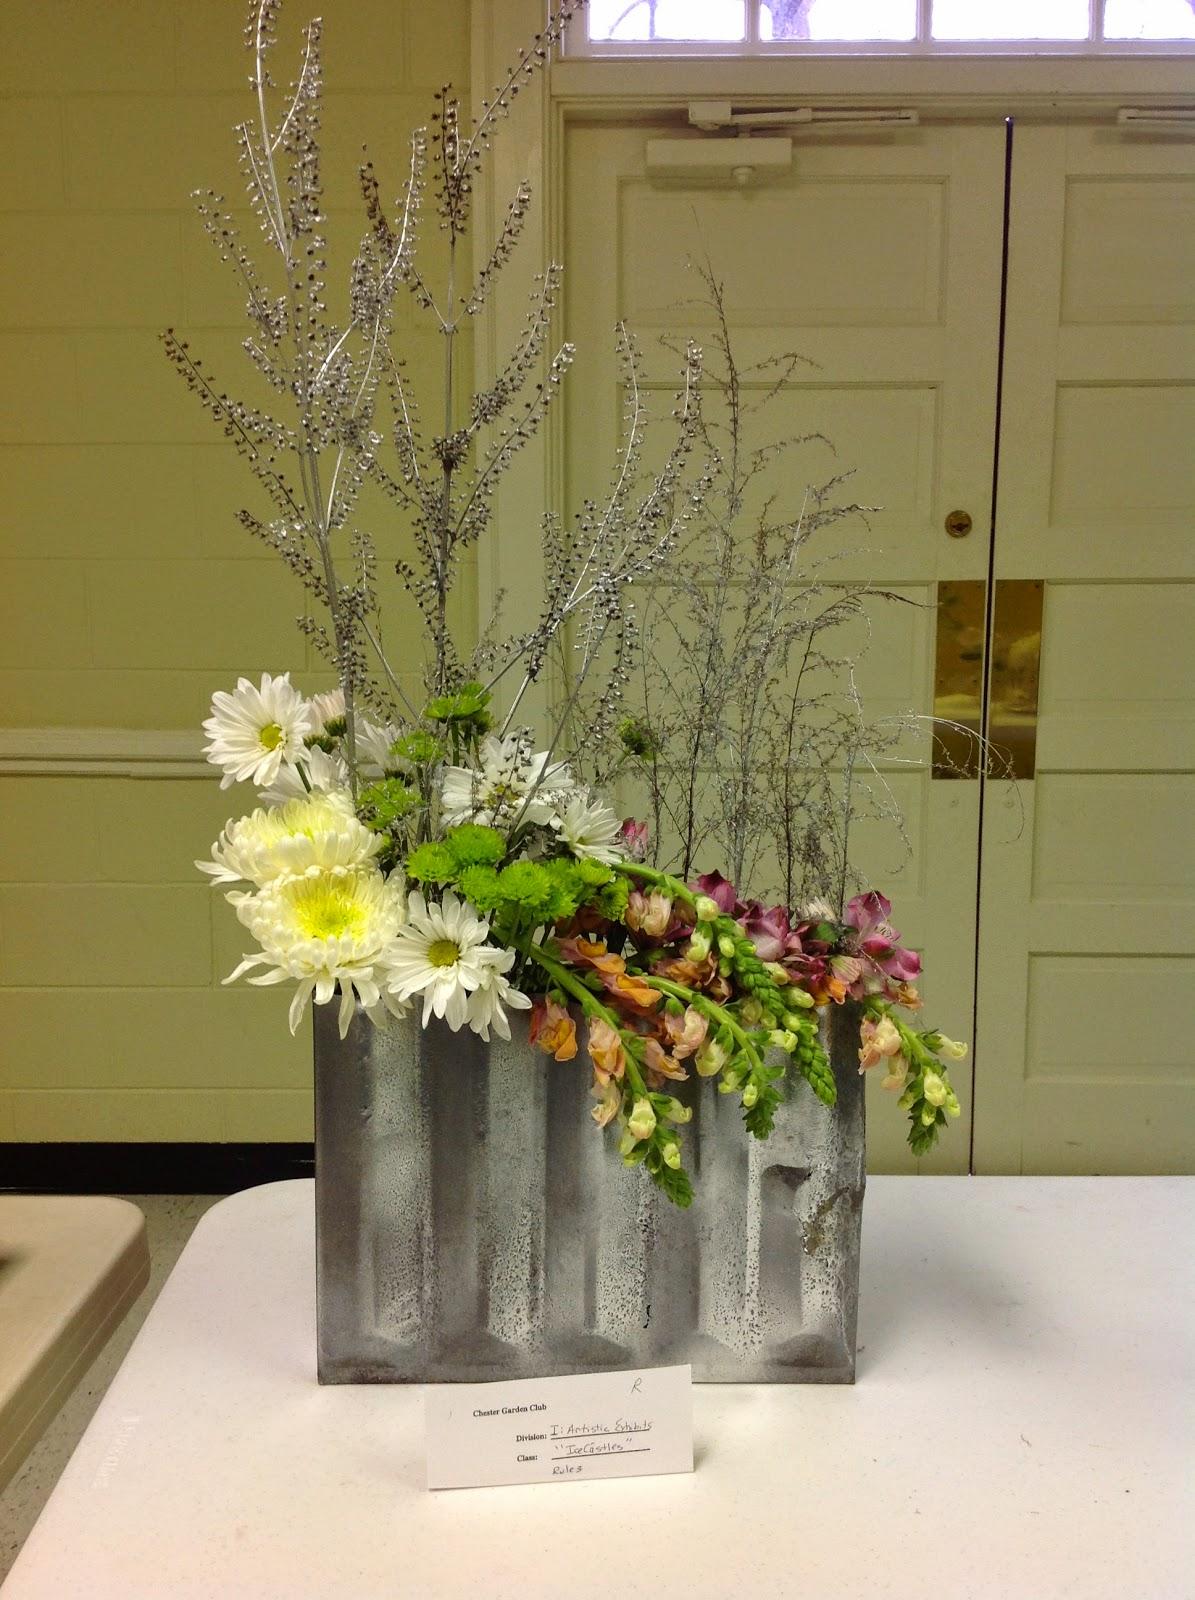 New Garden Club Journal Ice Castles a creative Design